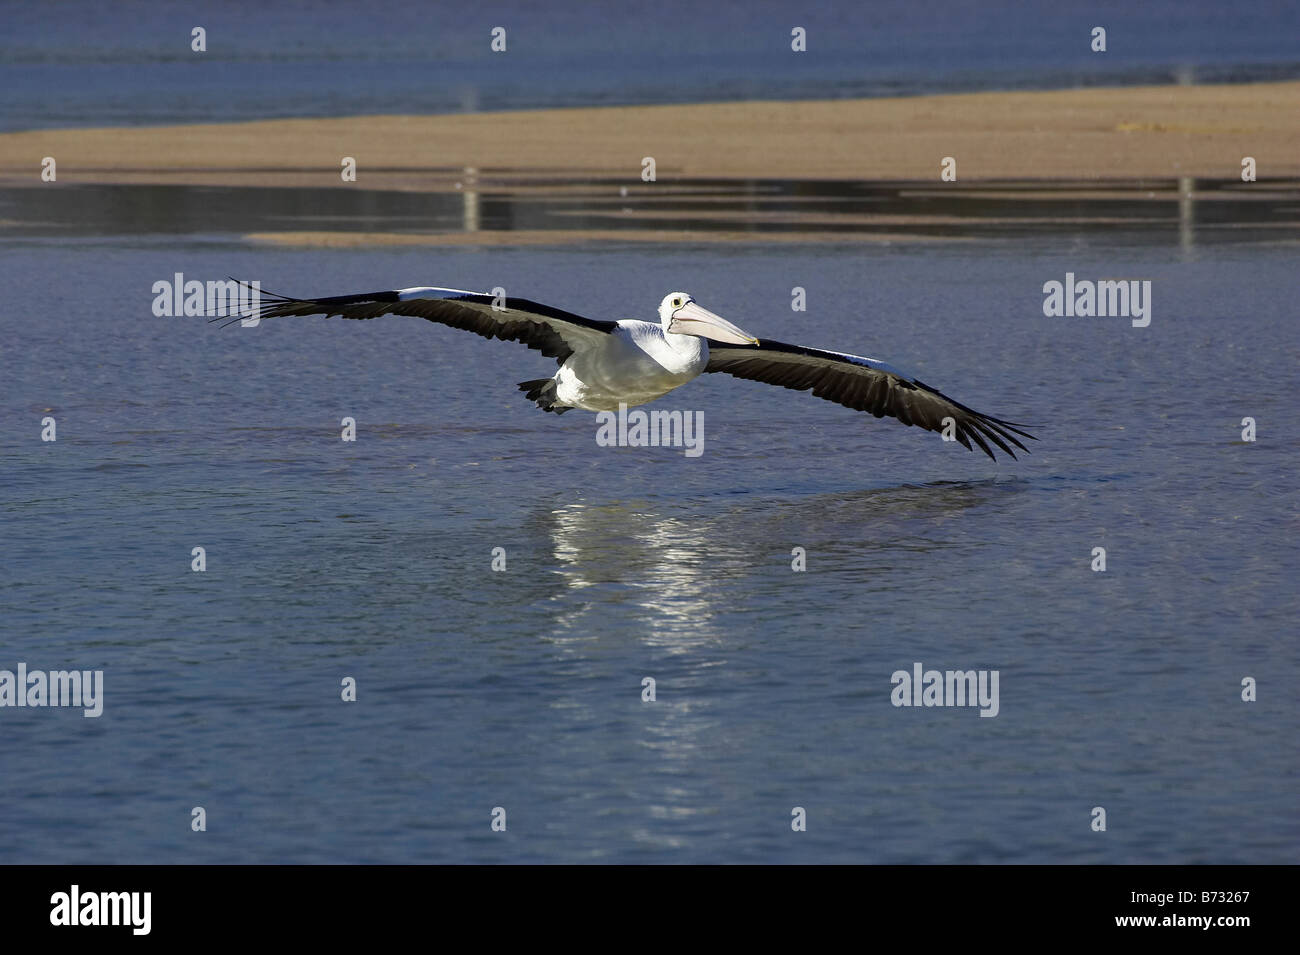 Australian Pelican Pelecanus conspicillatus Flying at The Entrance New South Wales Australia - Stock Image